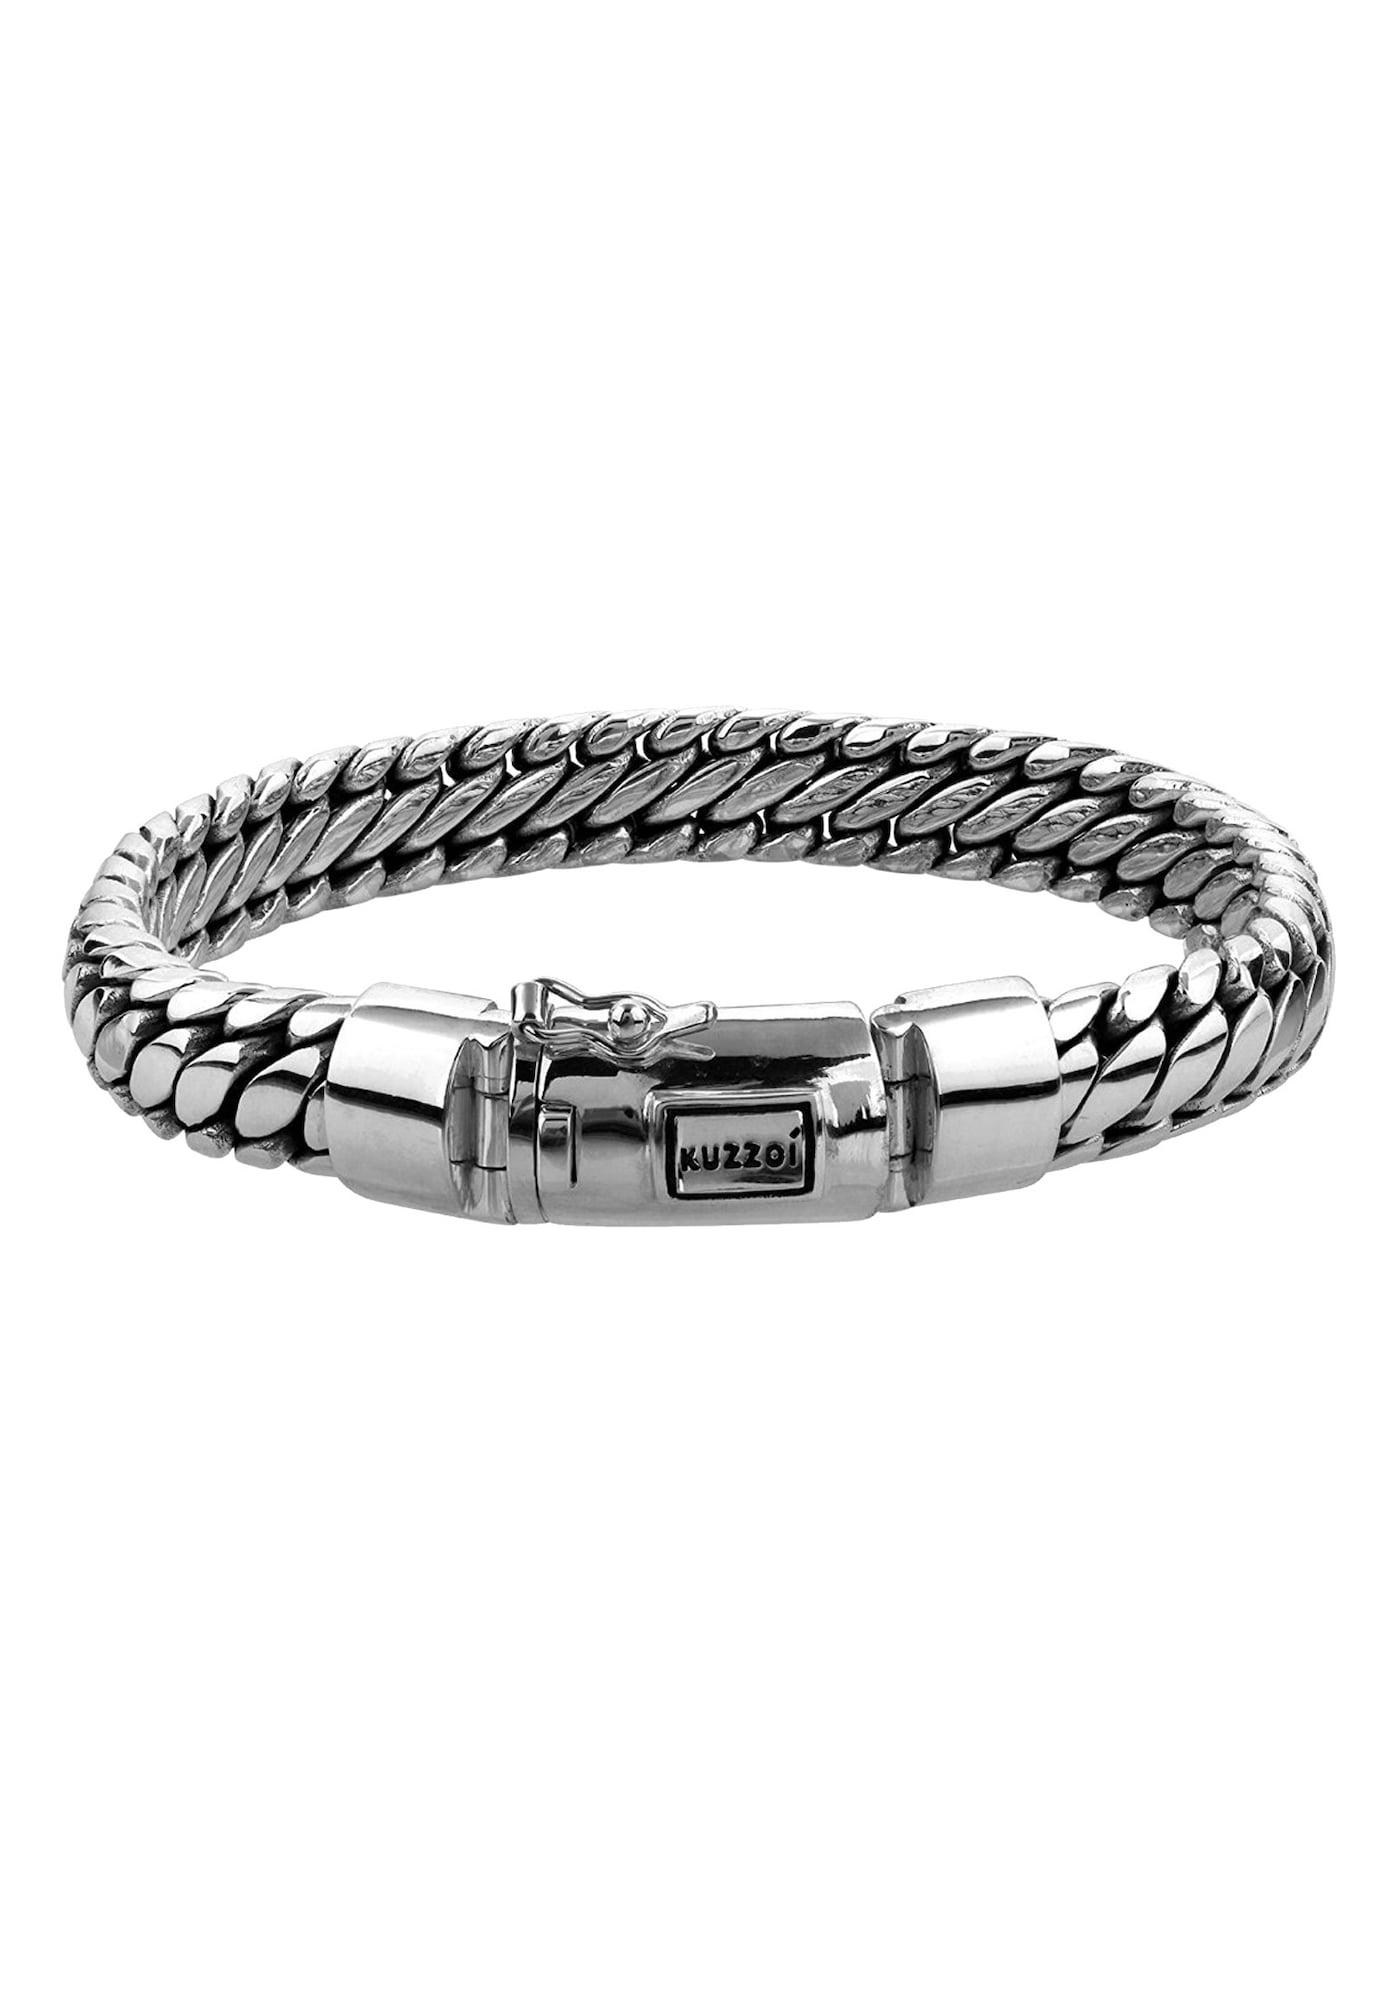 Armband 'Twisted' | Schmuck > Armbänder | Silber | KUZZOI